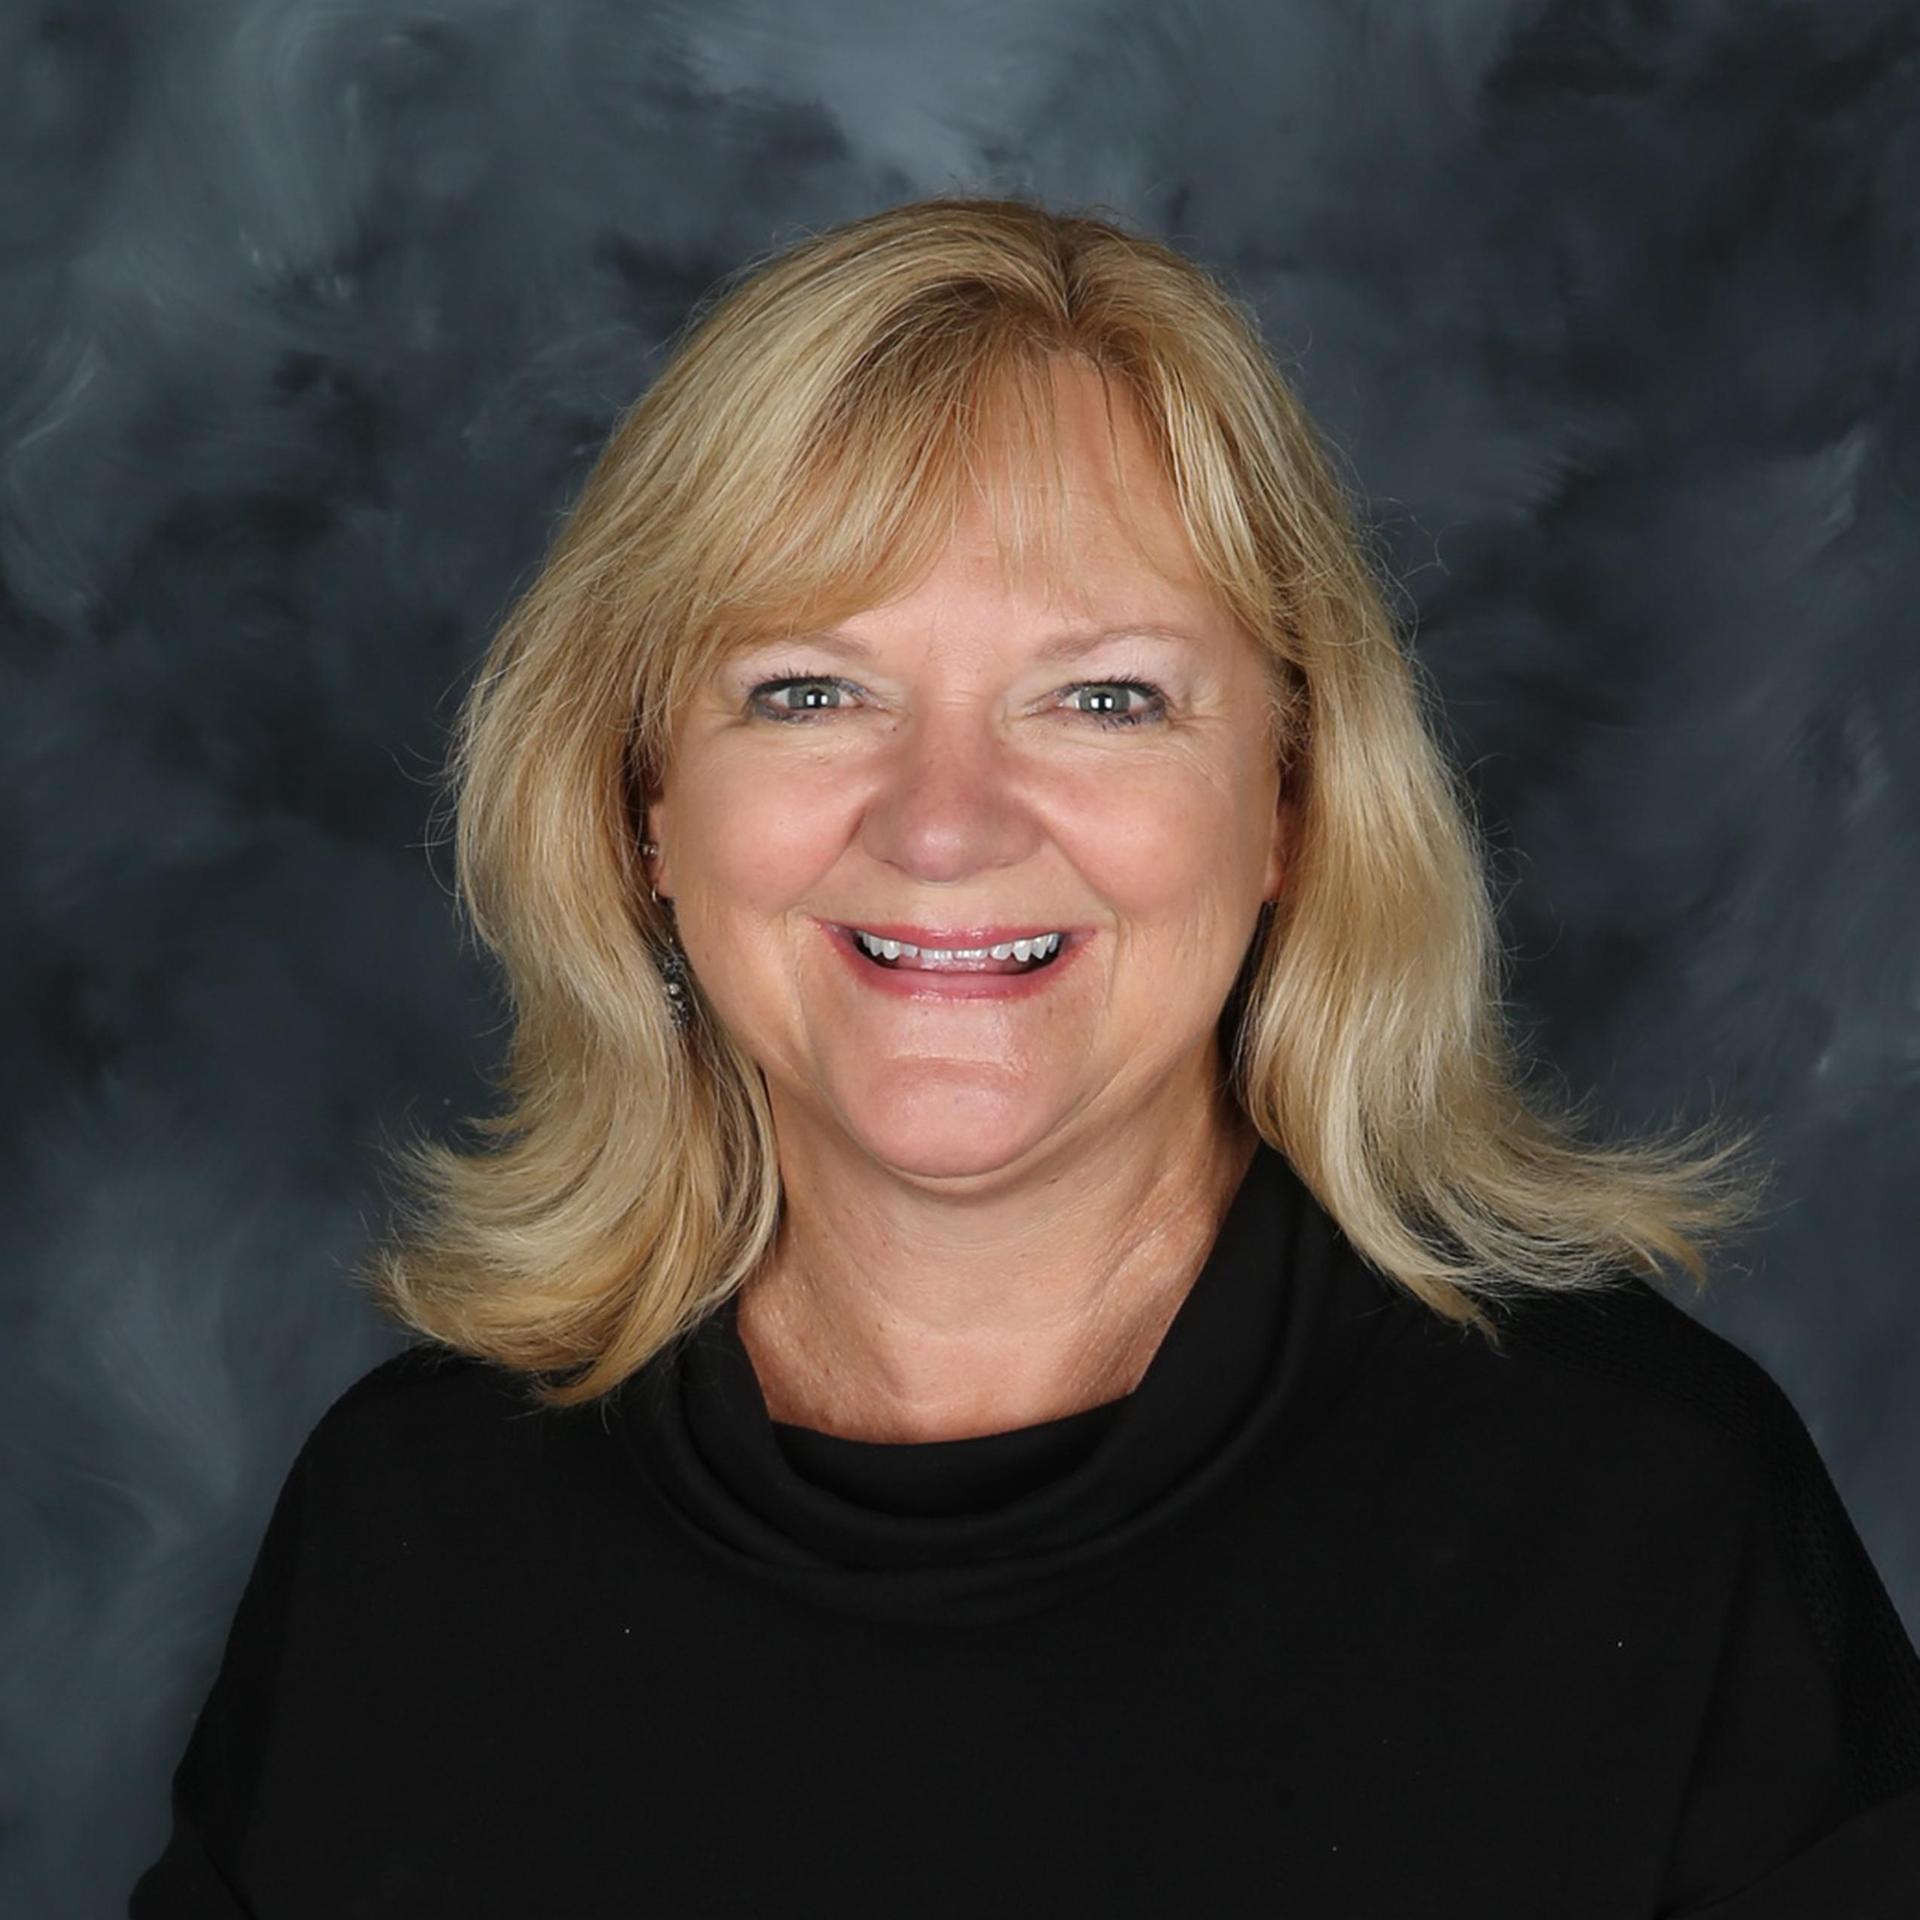 Dr. Amy Doran